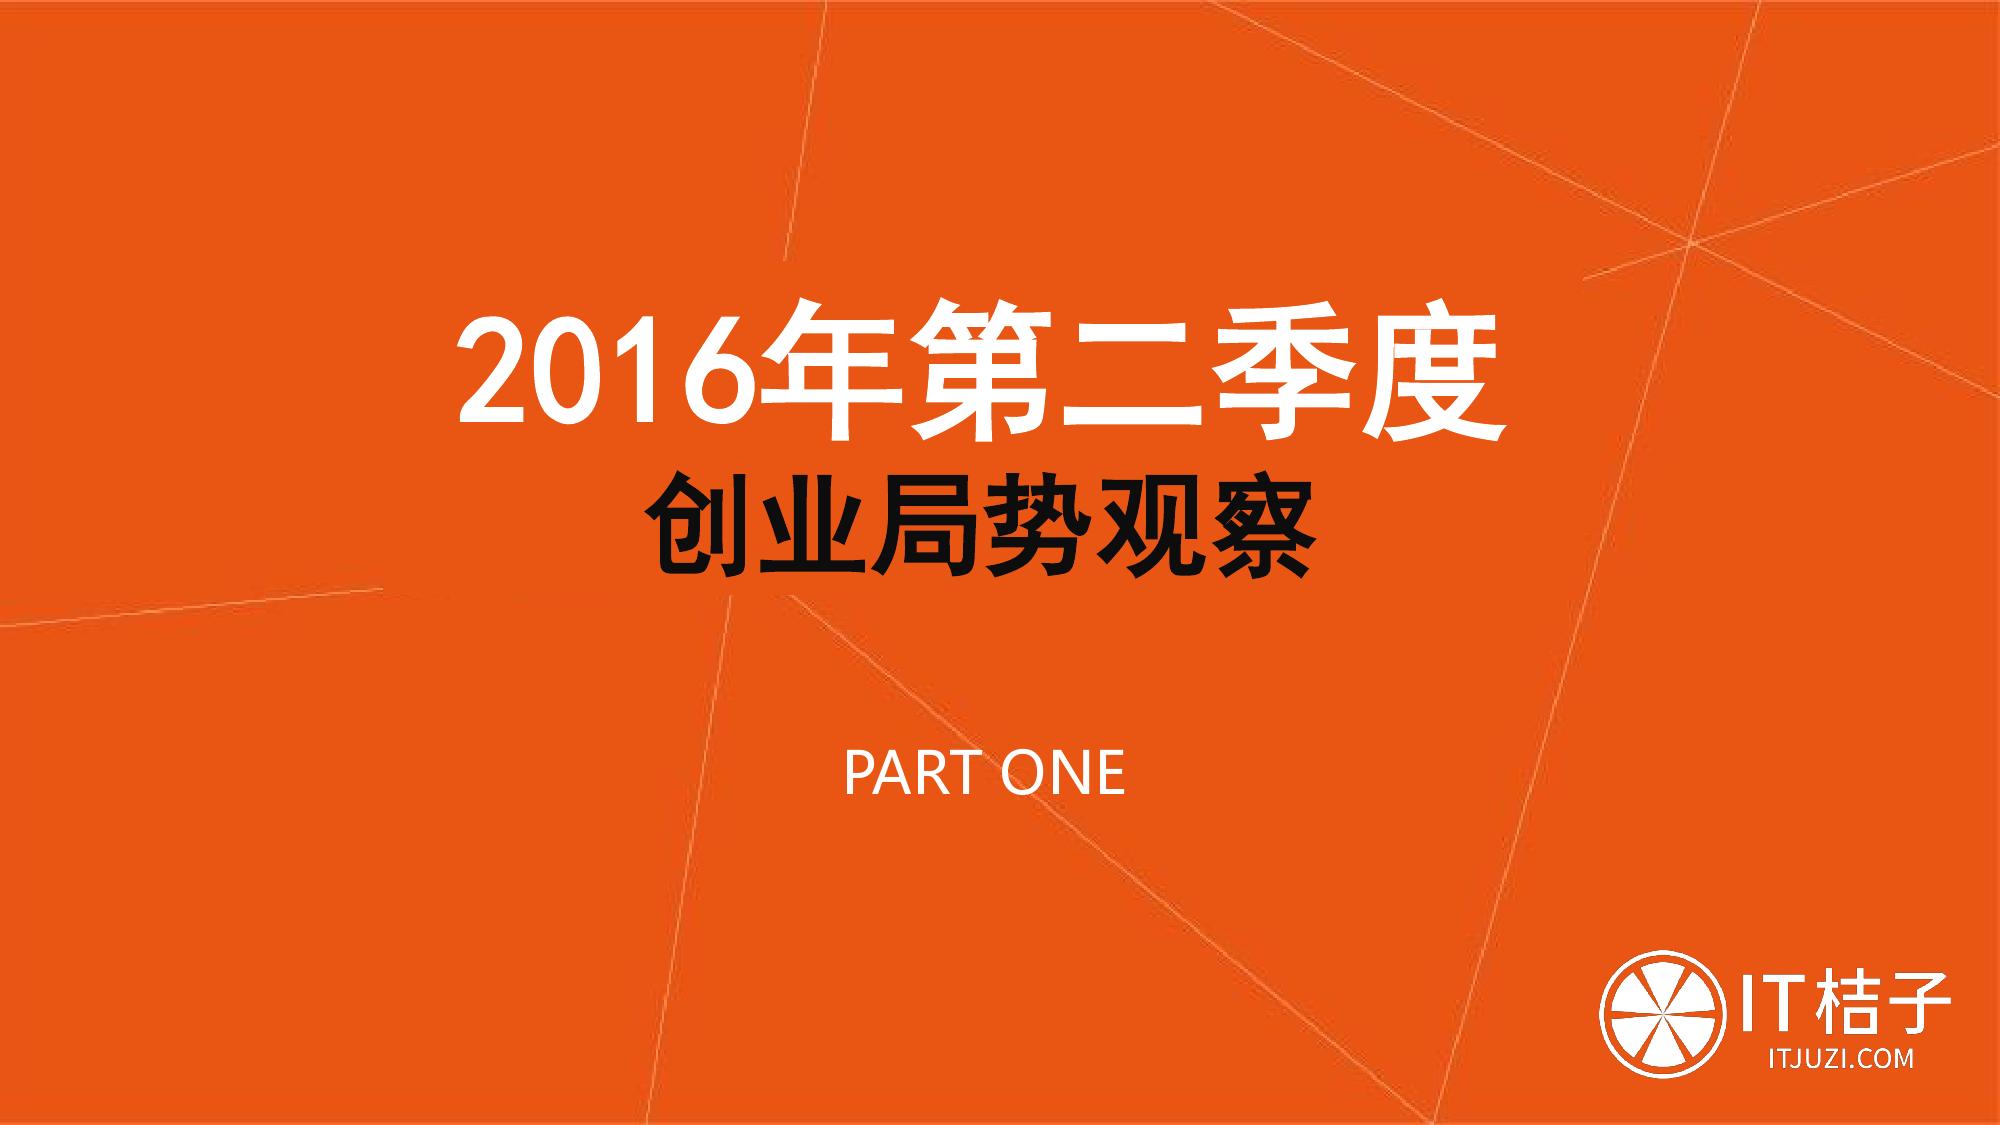 【IT桔子】2016年Q2中国互联网创业投资分析报告_000003